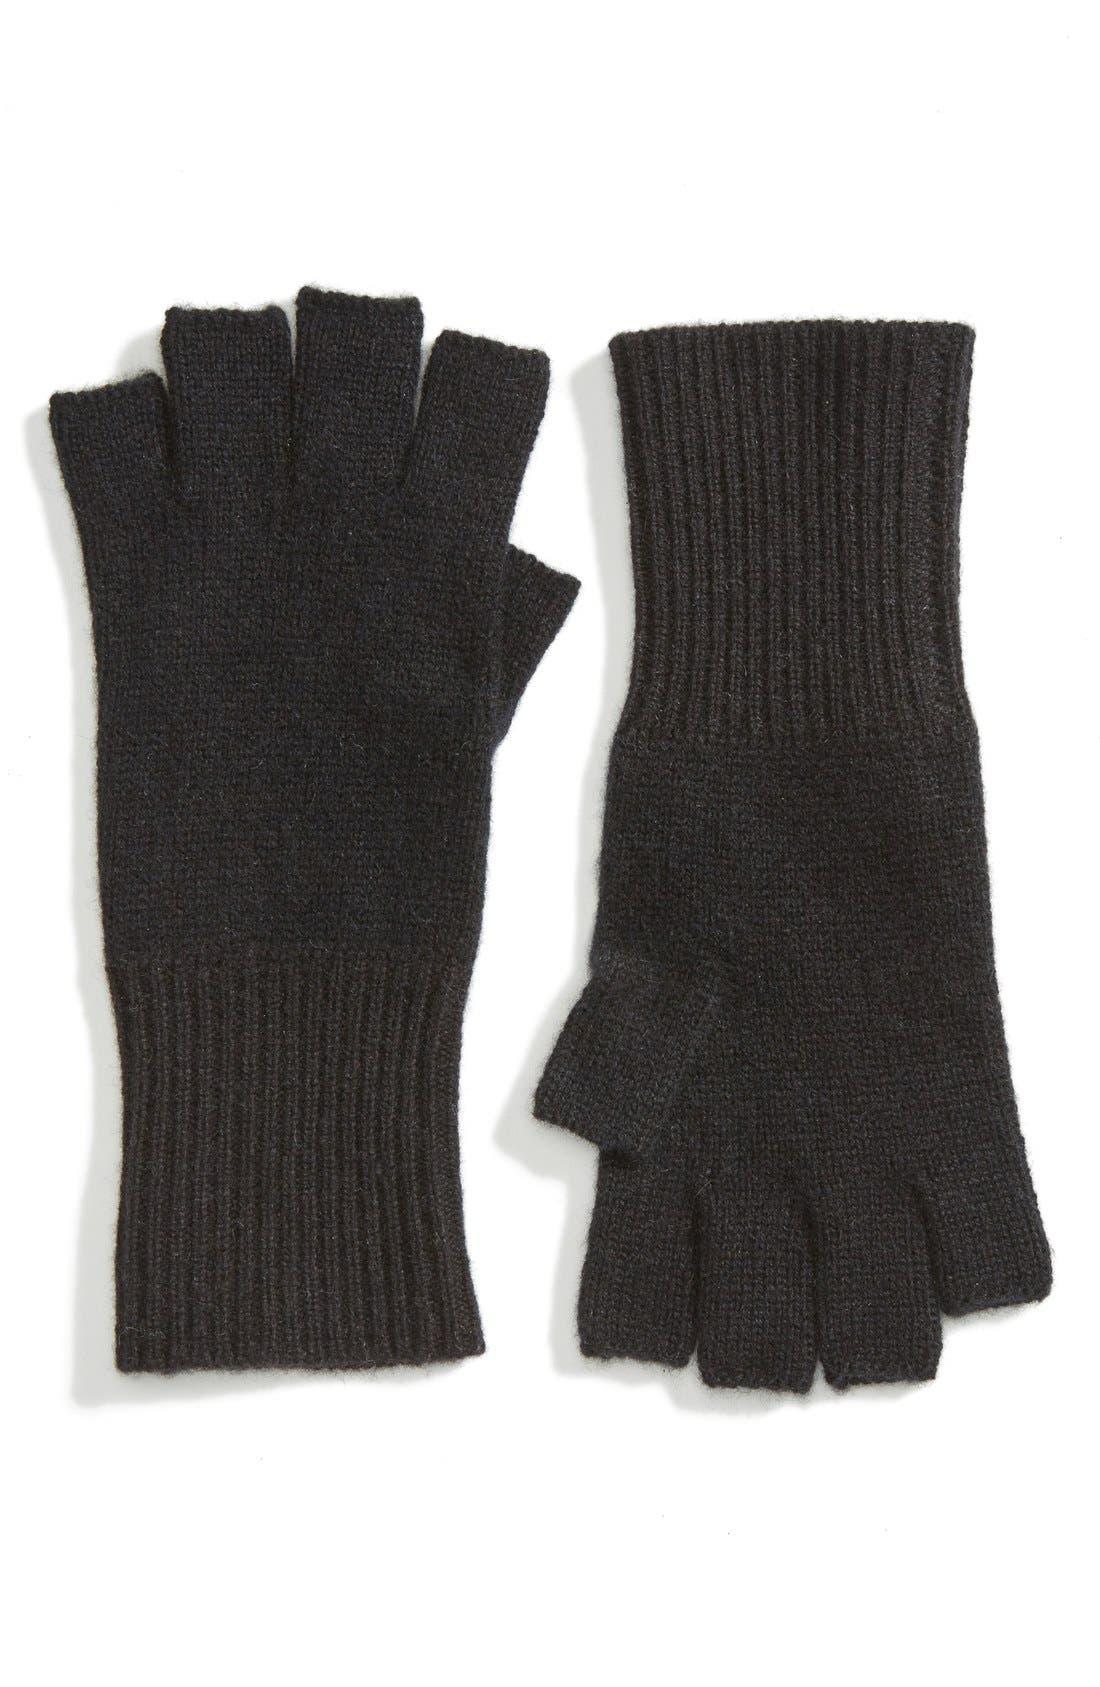 Cashmere Fingerless Gloves,                         Main,                         color, Black